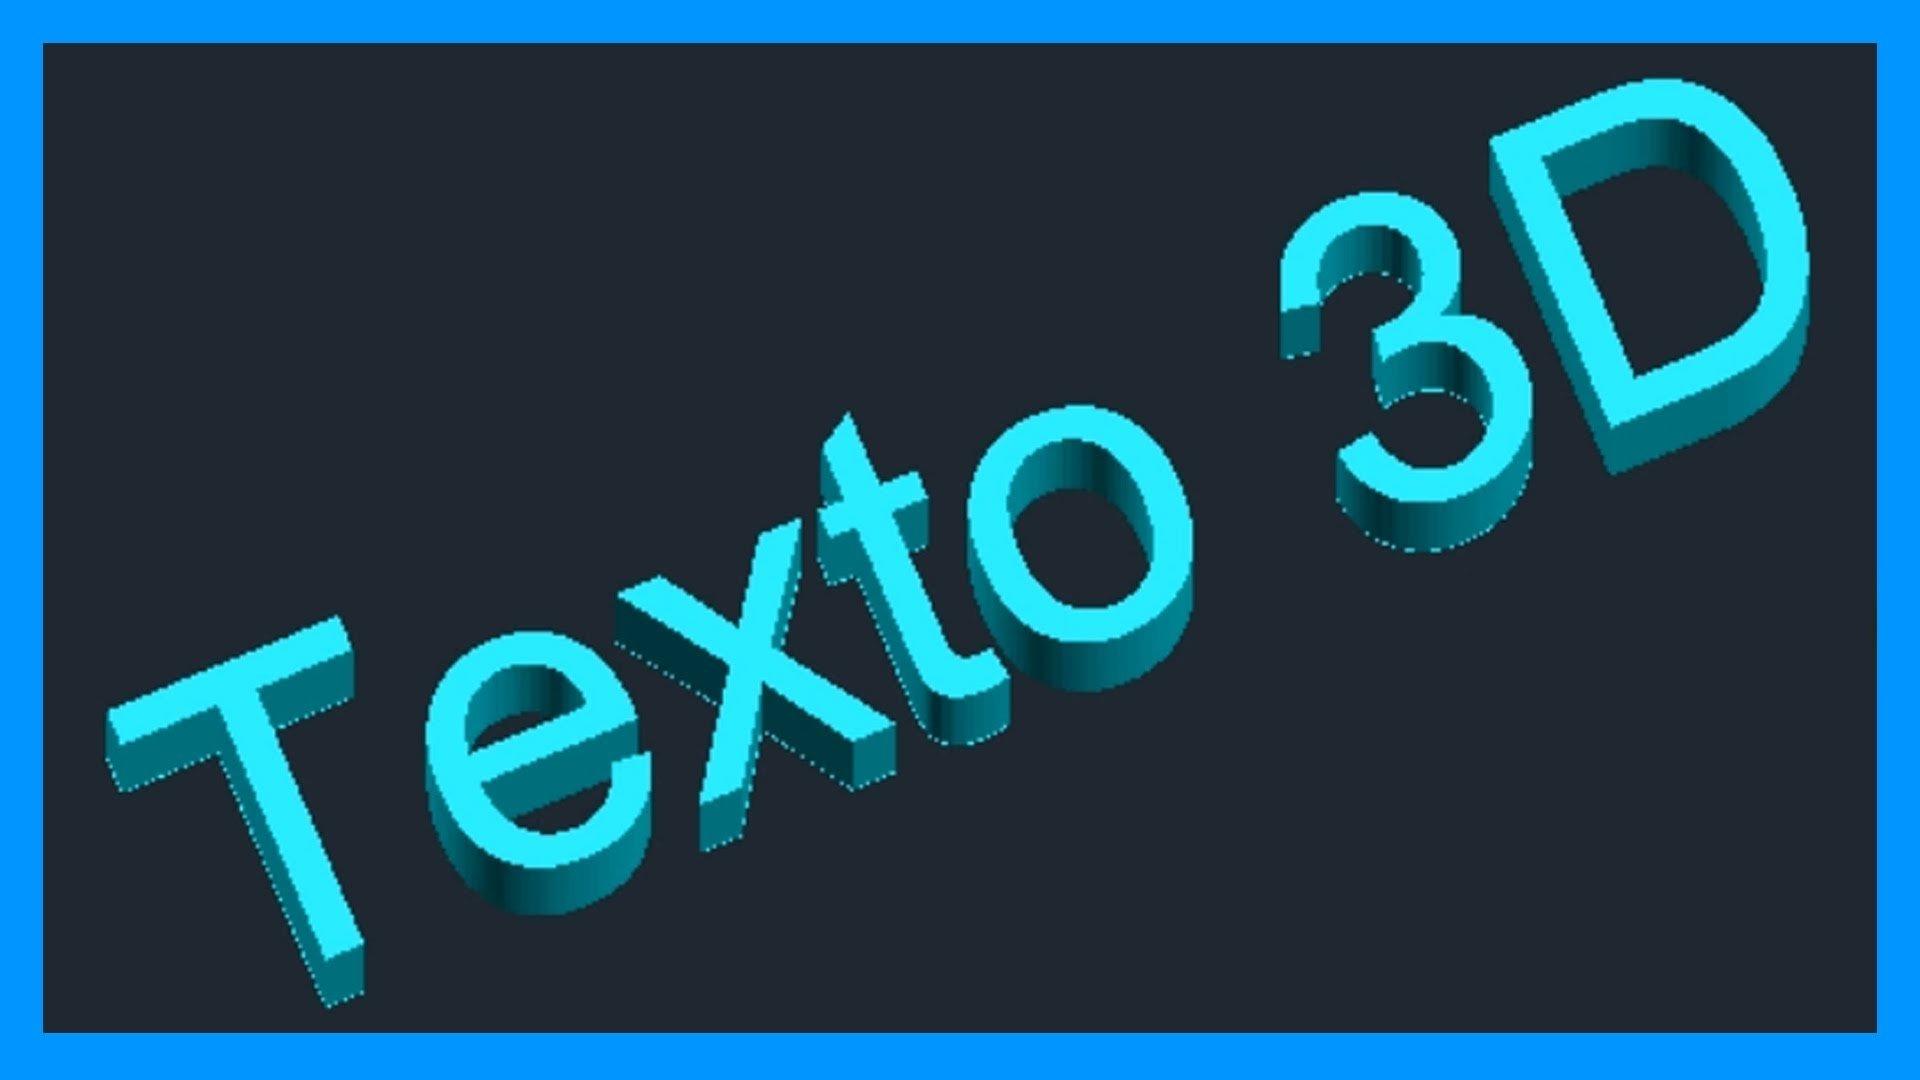 Autocad – Texto 3D. Extruir texto. Letras, números y símbolos 3D.